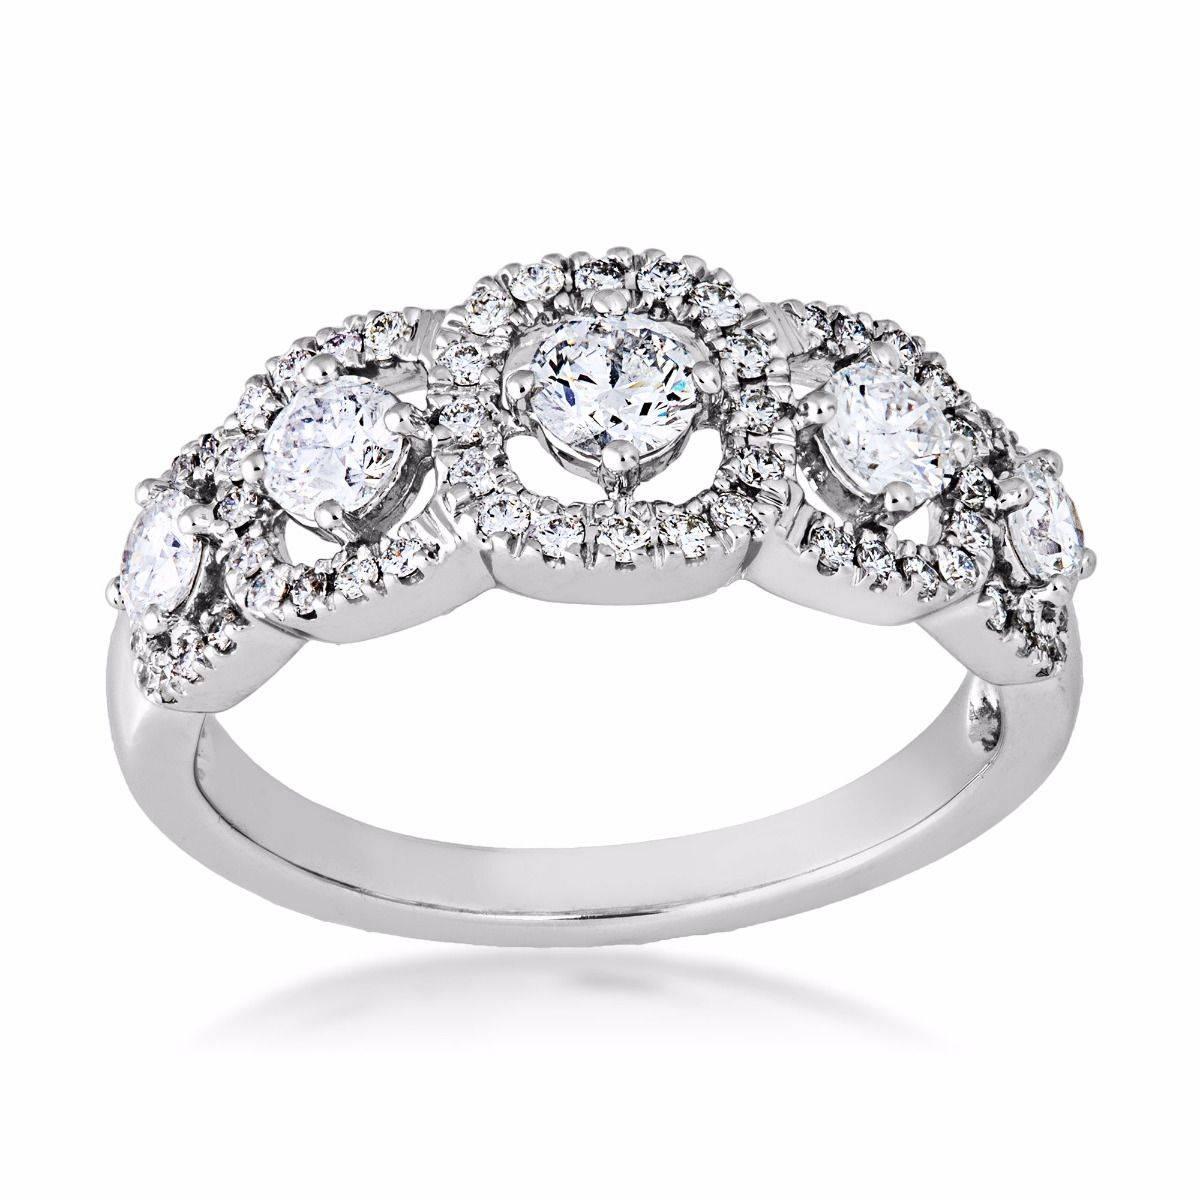 Women's Diamond Anniversary Bands – Shop Anniversary Rings, Bands Intended For 2018 Womens Anniversary Rings (View 25 of 25)